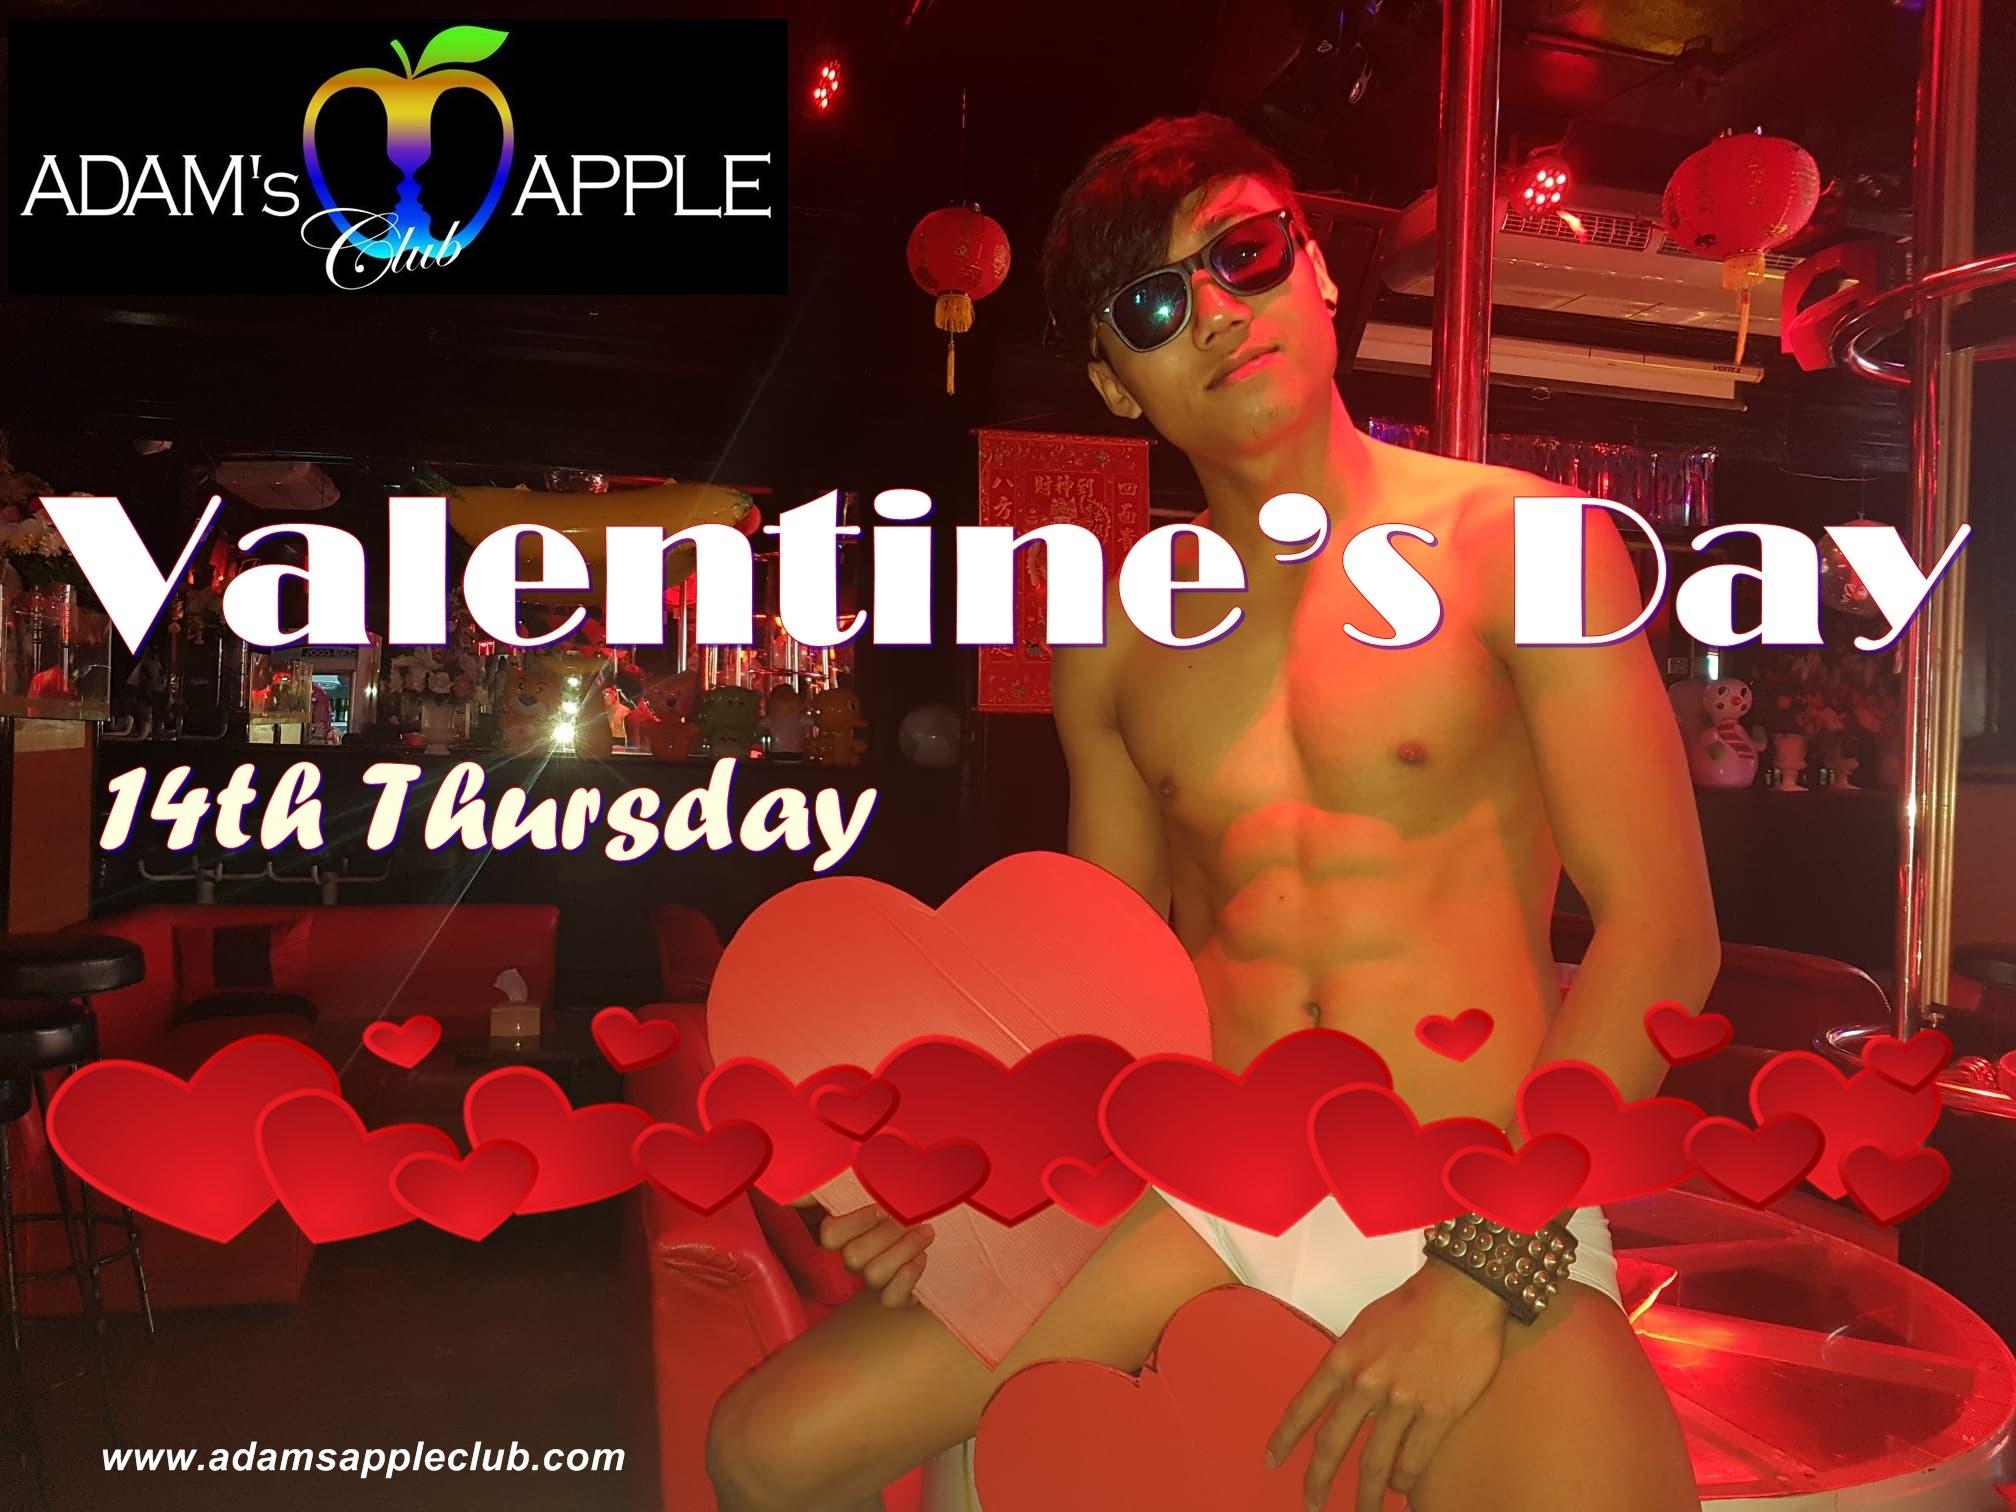 Valentine's Day Adams Apple Club Chiang Mai